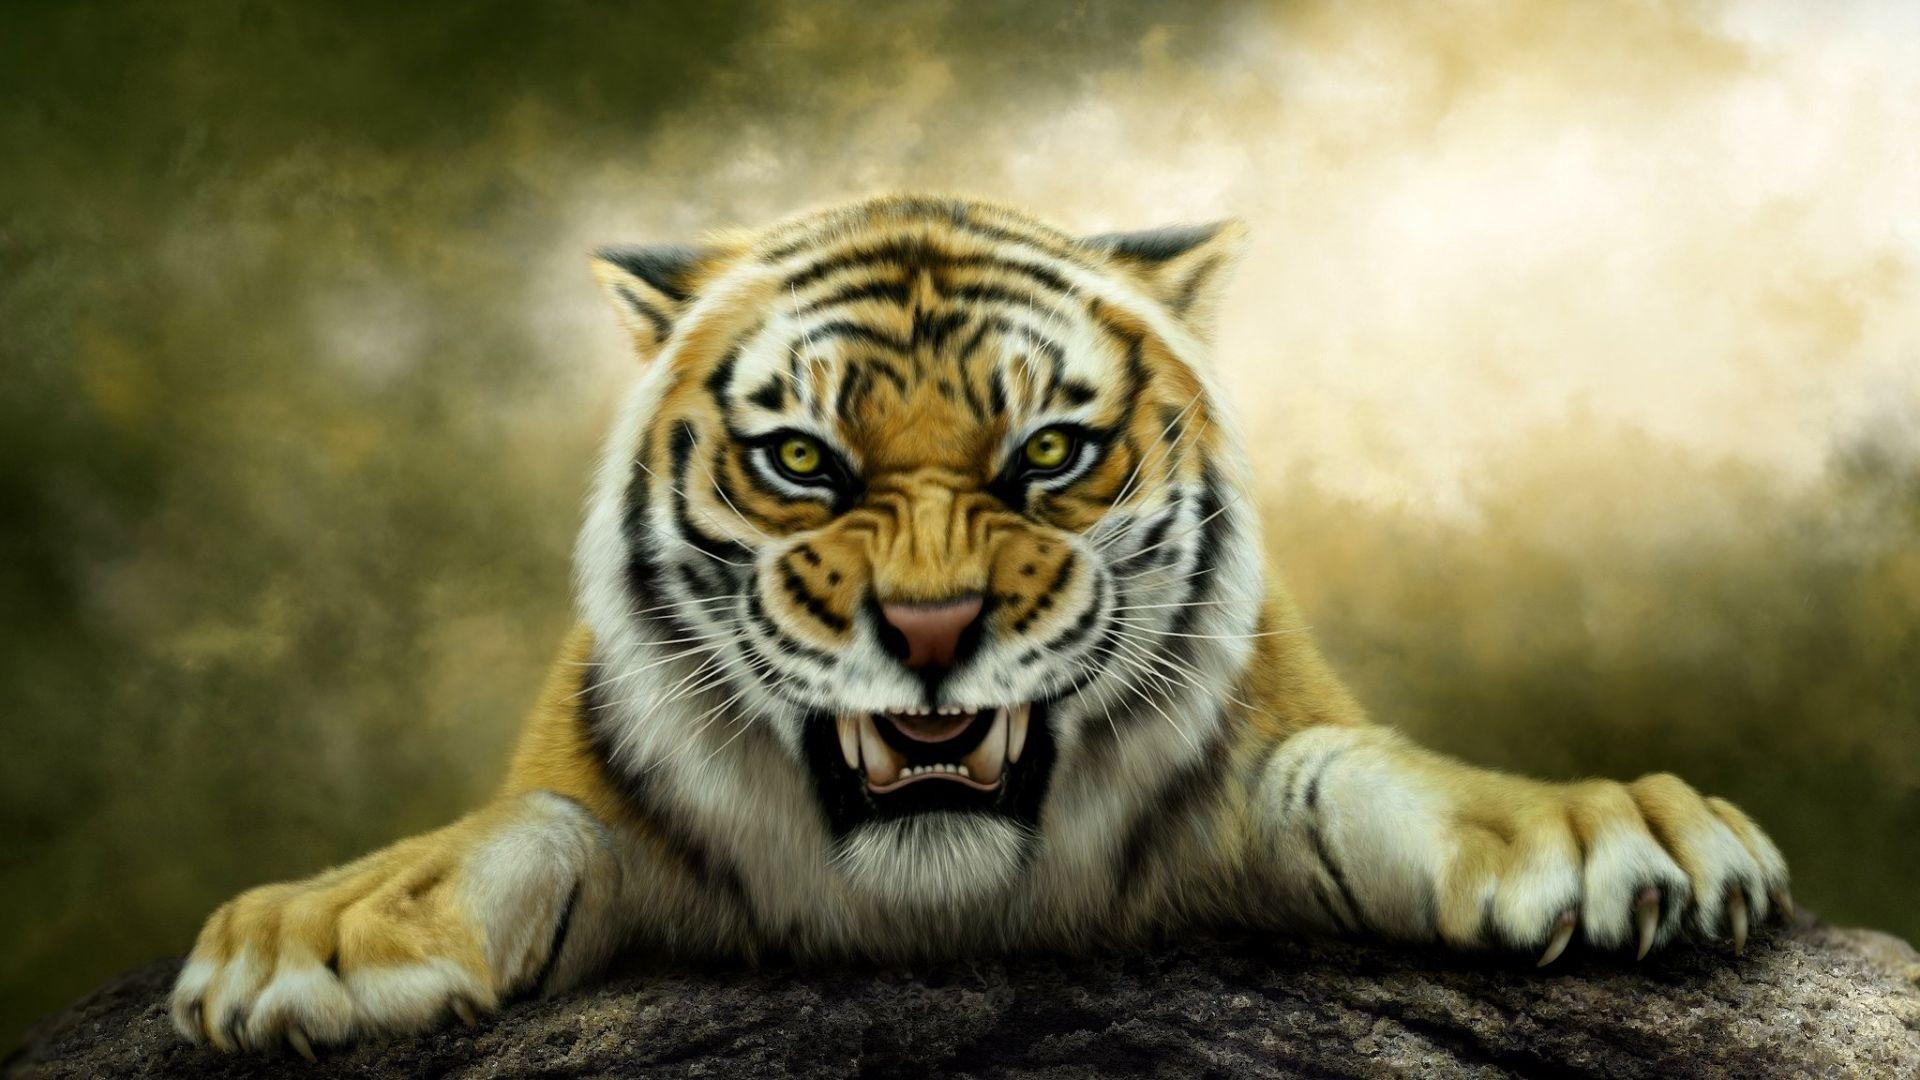 Tiger Art Angry, Free Desktop Wallpaper